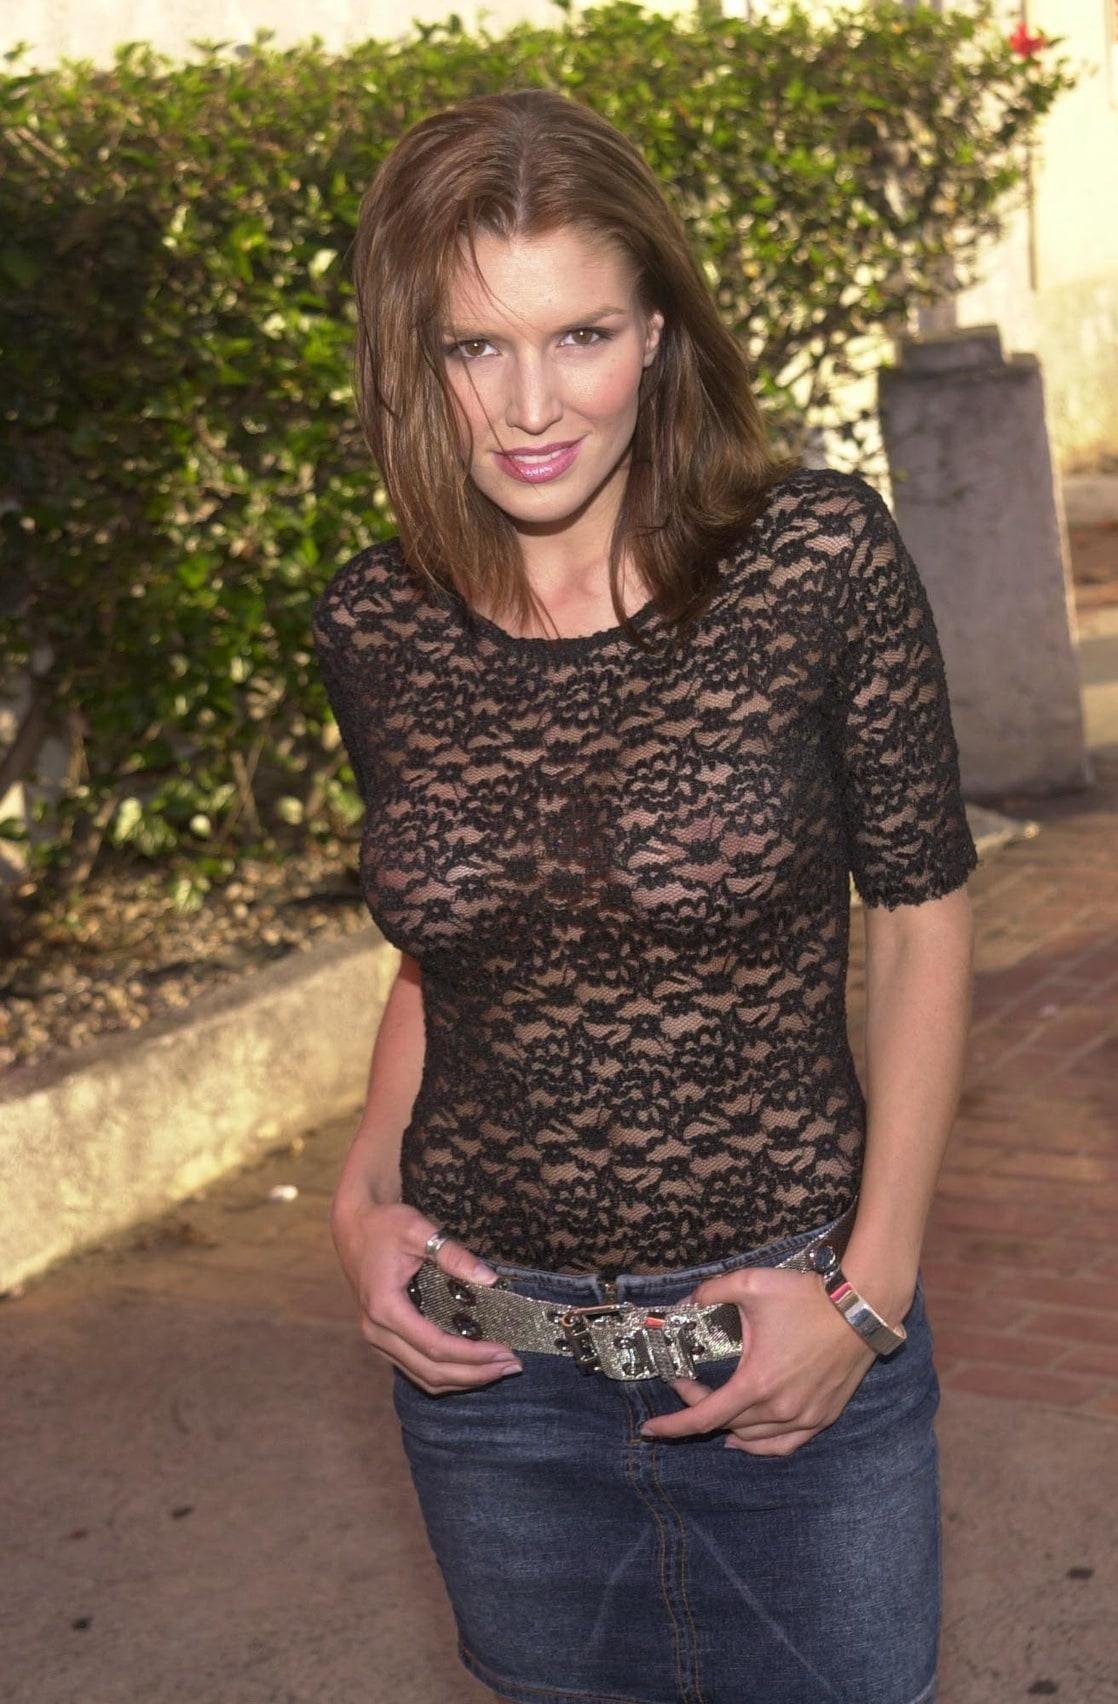 Nina Kaczorowski